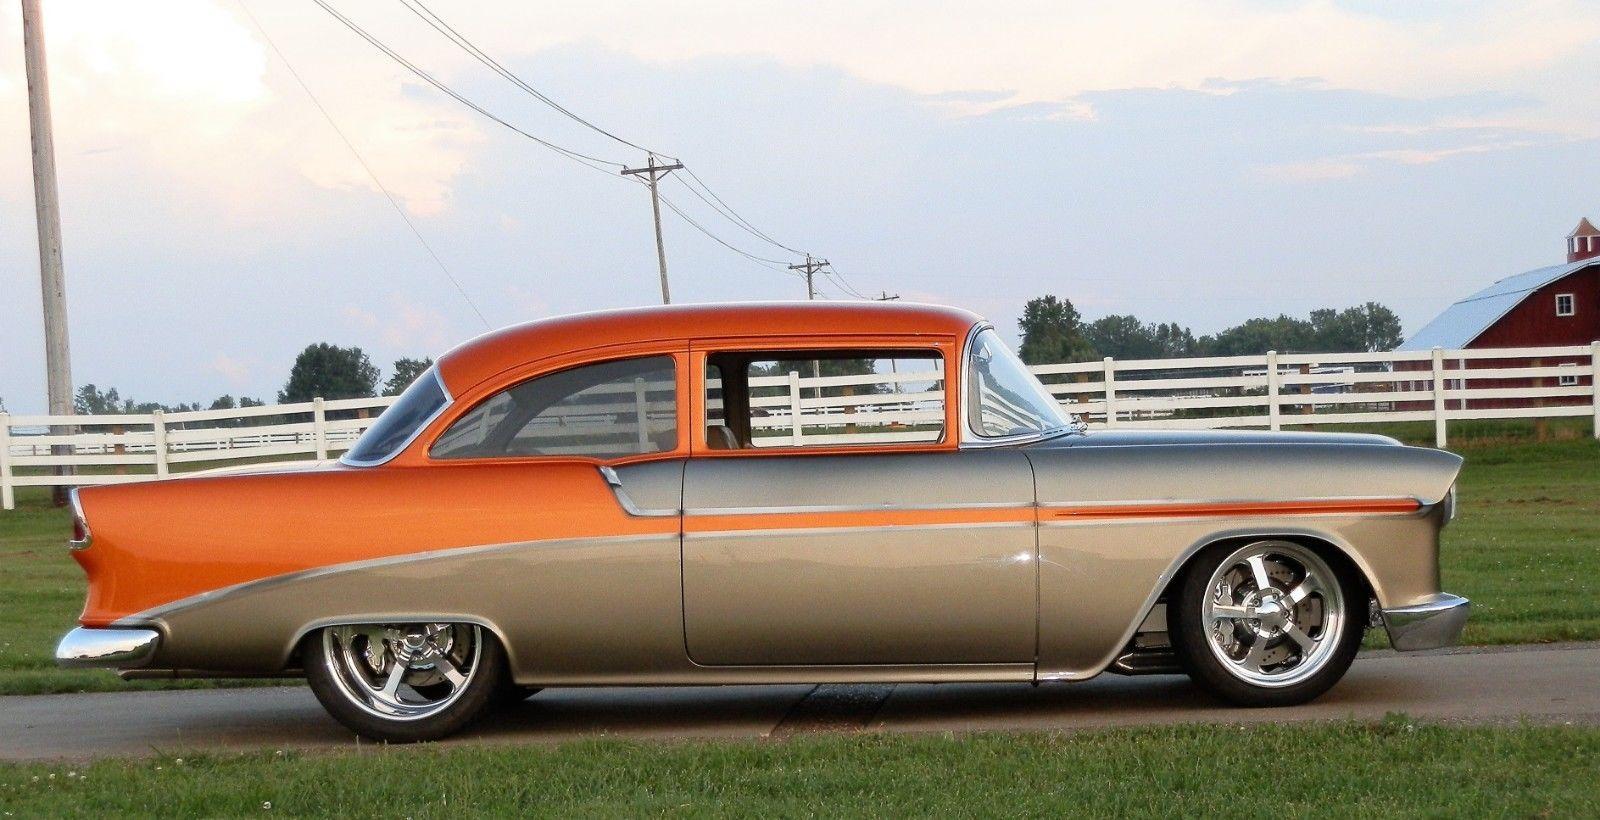 1955 Chevy Belair 2 Door Hardtop For Sale ✓ All About Chevrolet